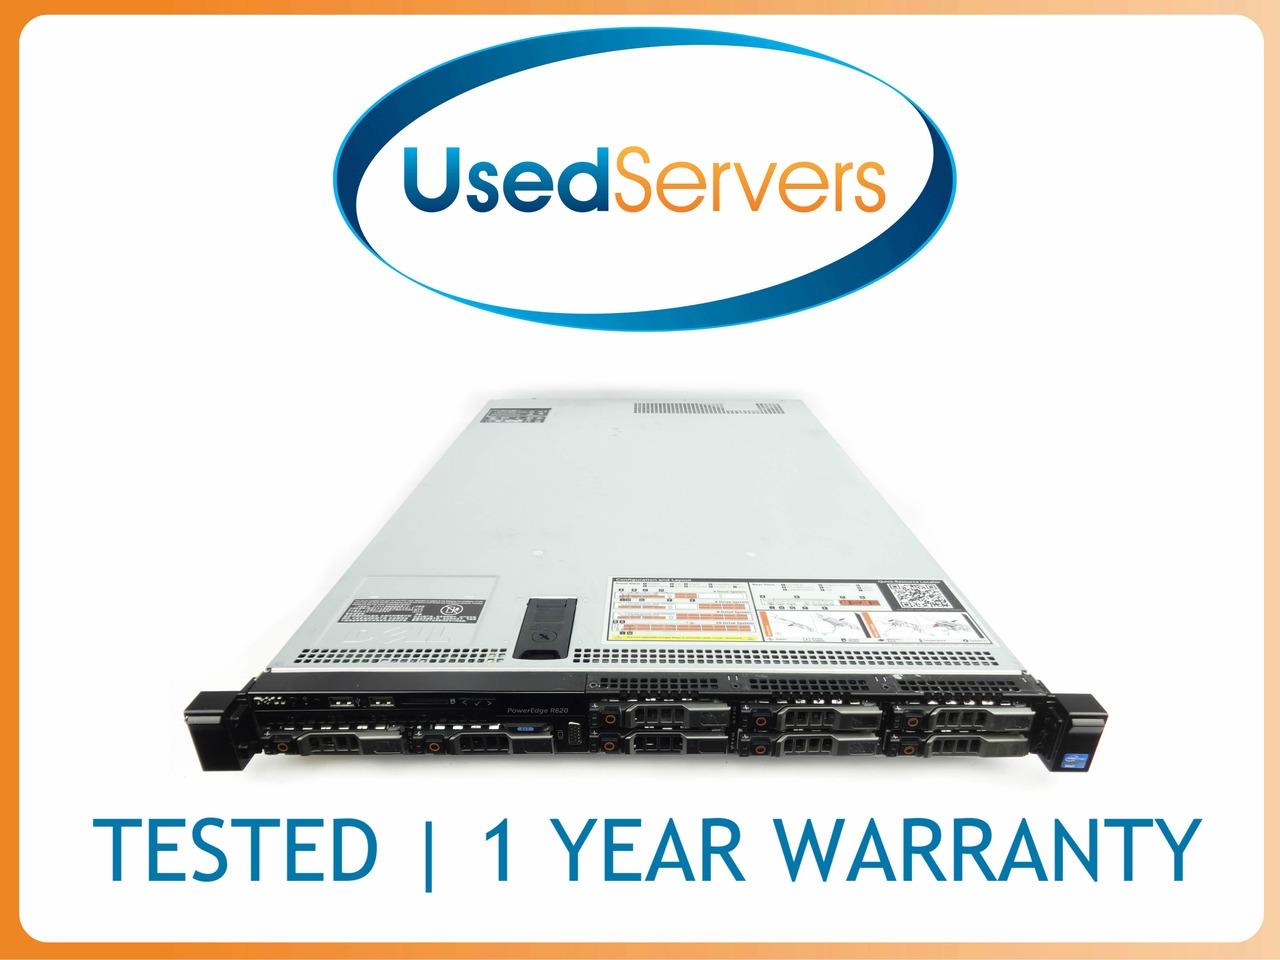 Dell Poweredge R620 Server   2x 8C 2 2GHZ   64GB   8x 480GB SSD